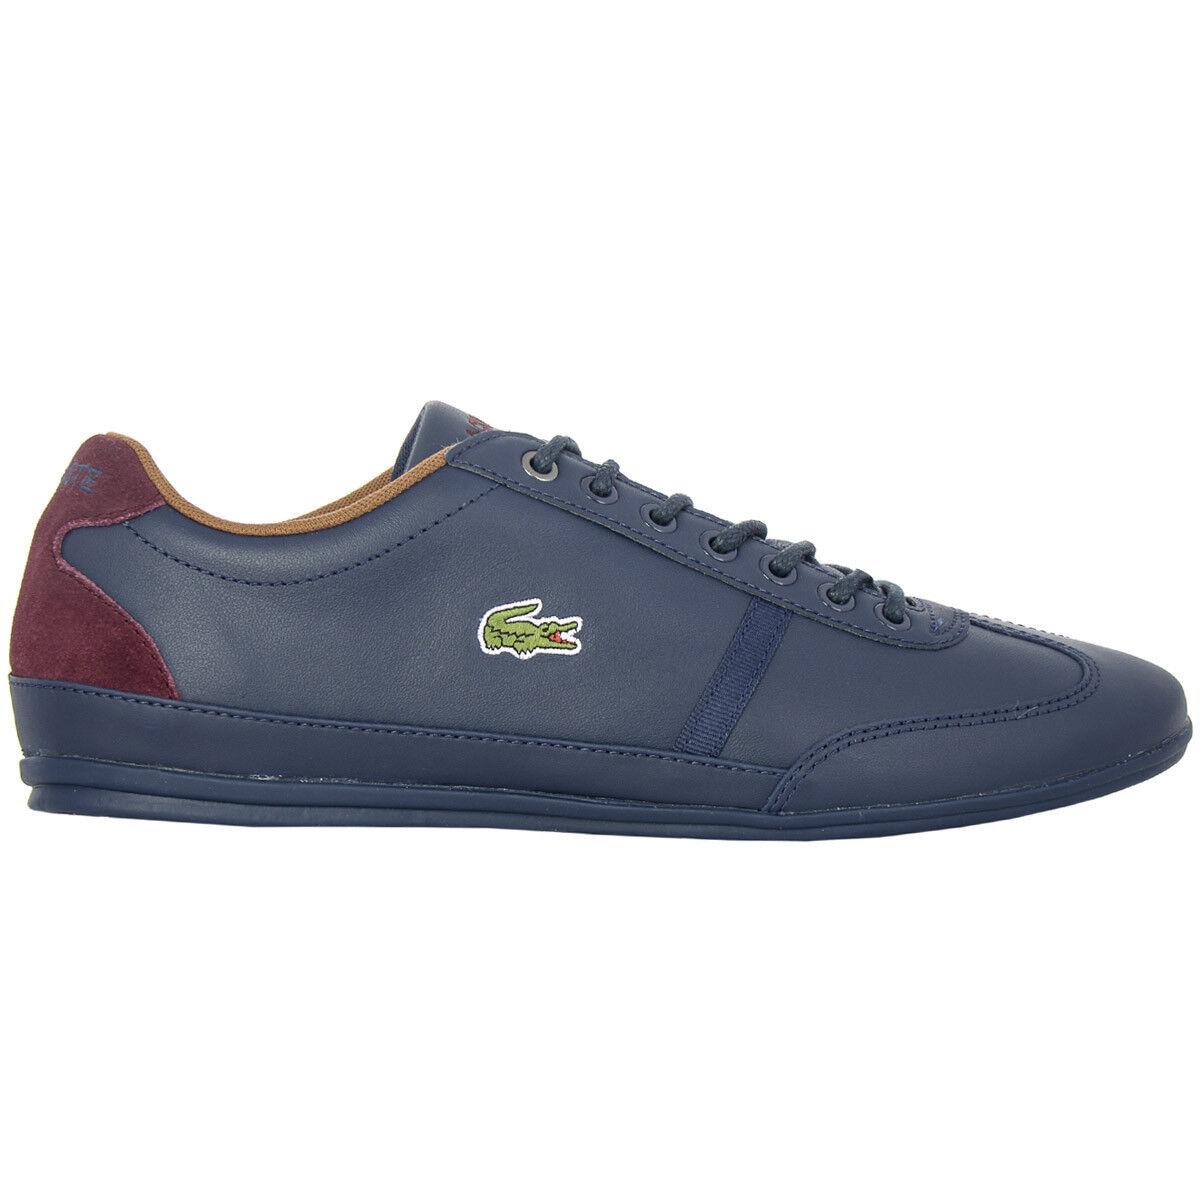 Lacoste Herren Sneaker Misano Sport Leder Navy-Blau Turnschuhe NEU CAM0046003